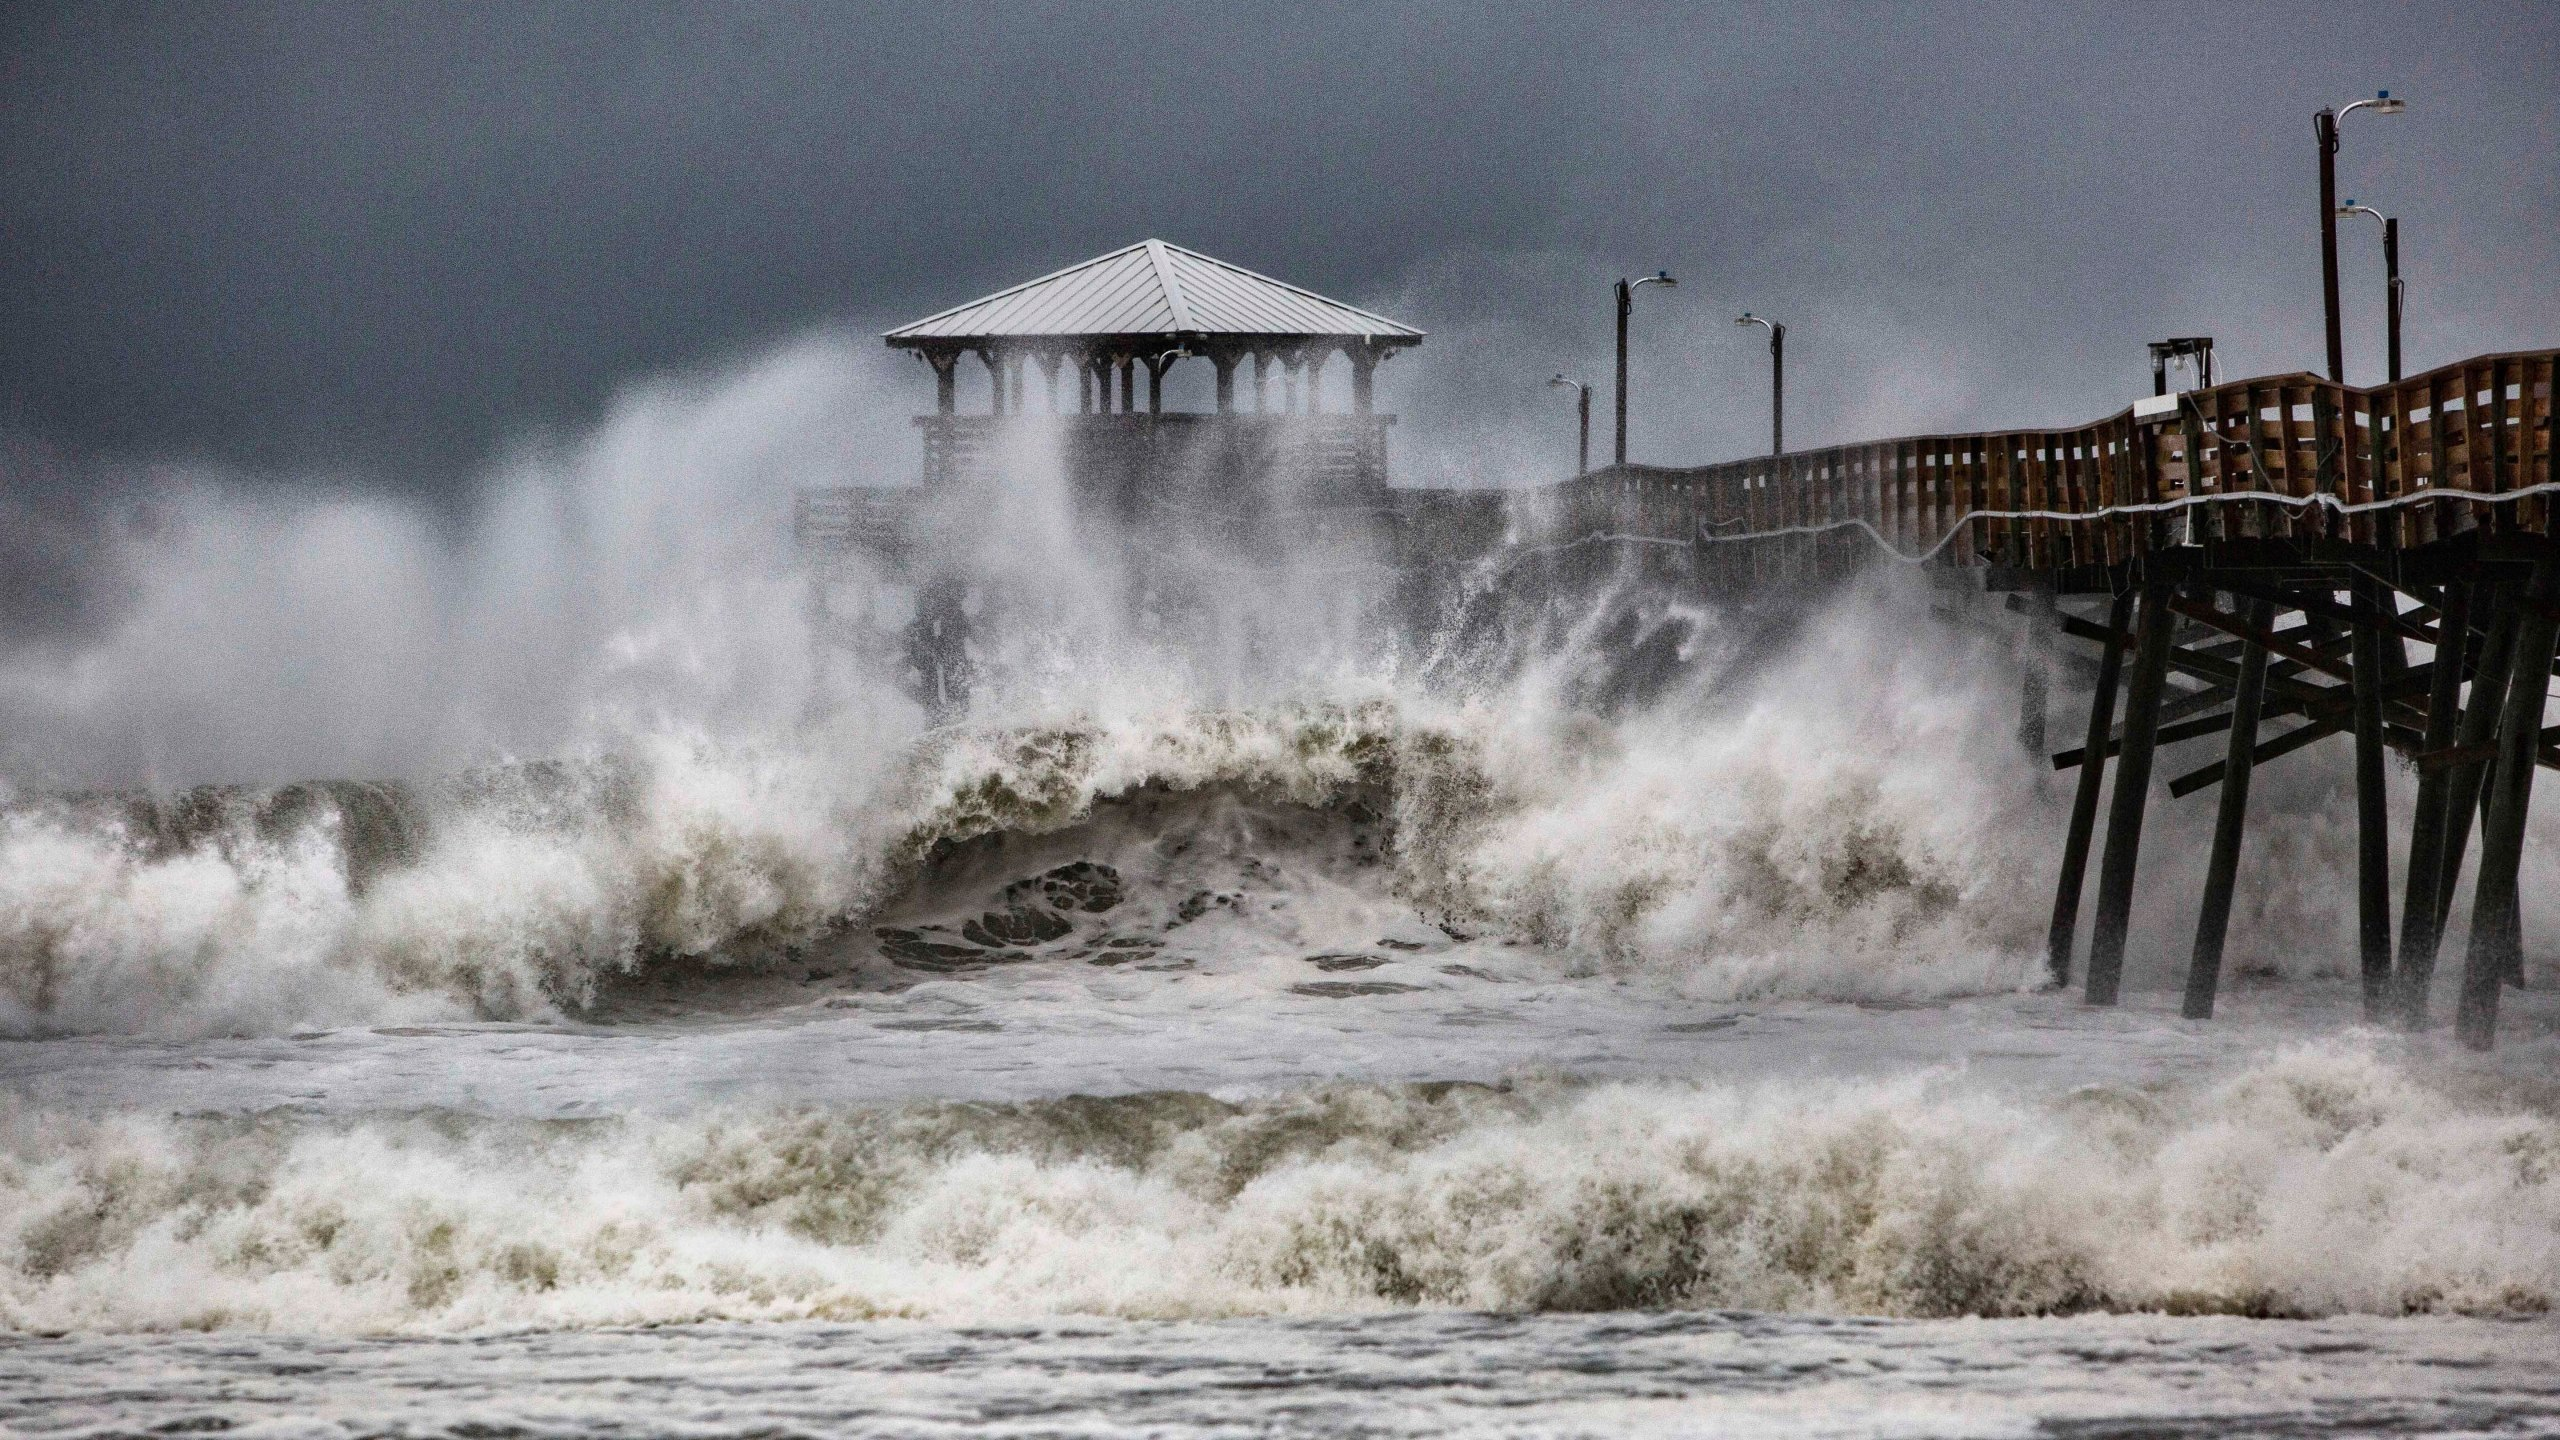 Hurricane_Florence_Camp_Lejeune_19055-159532.jpg31771965